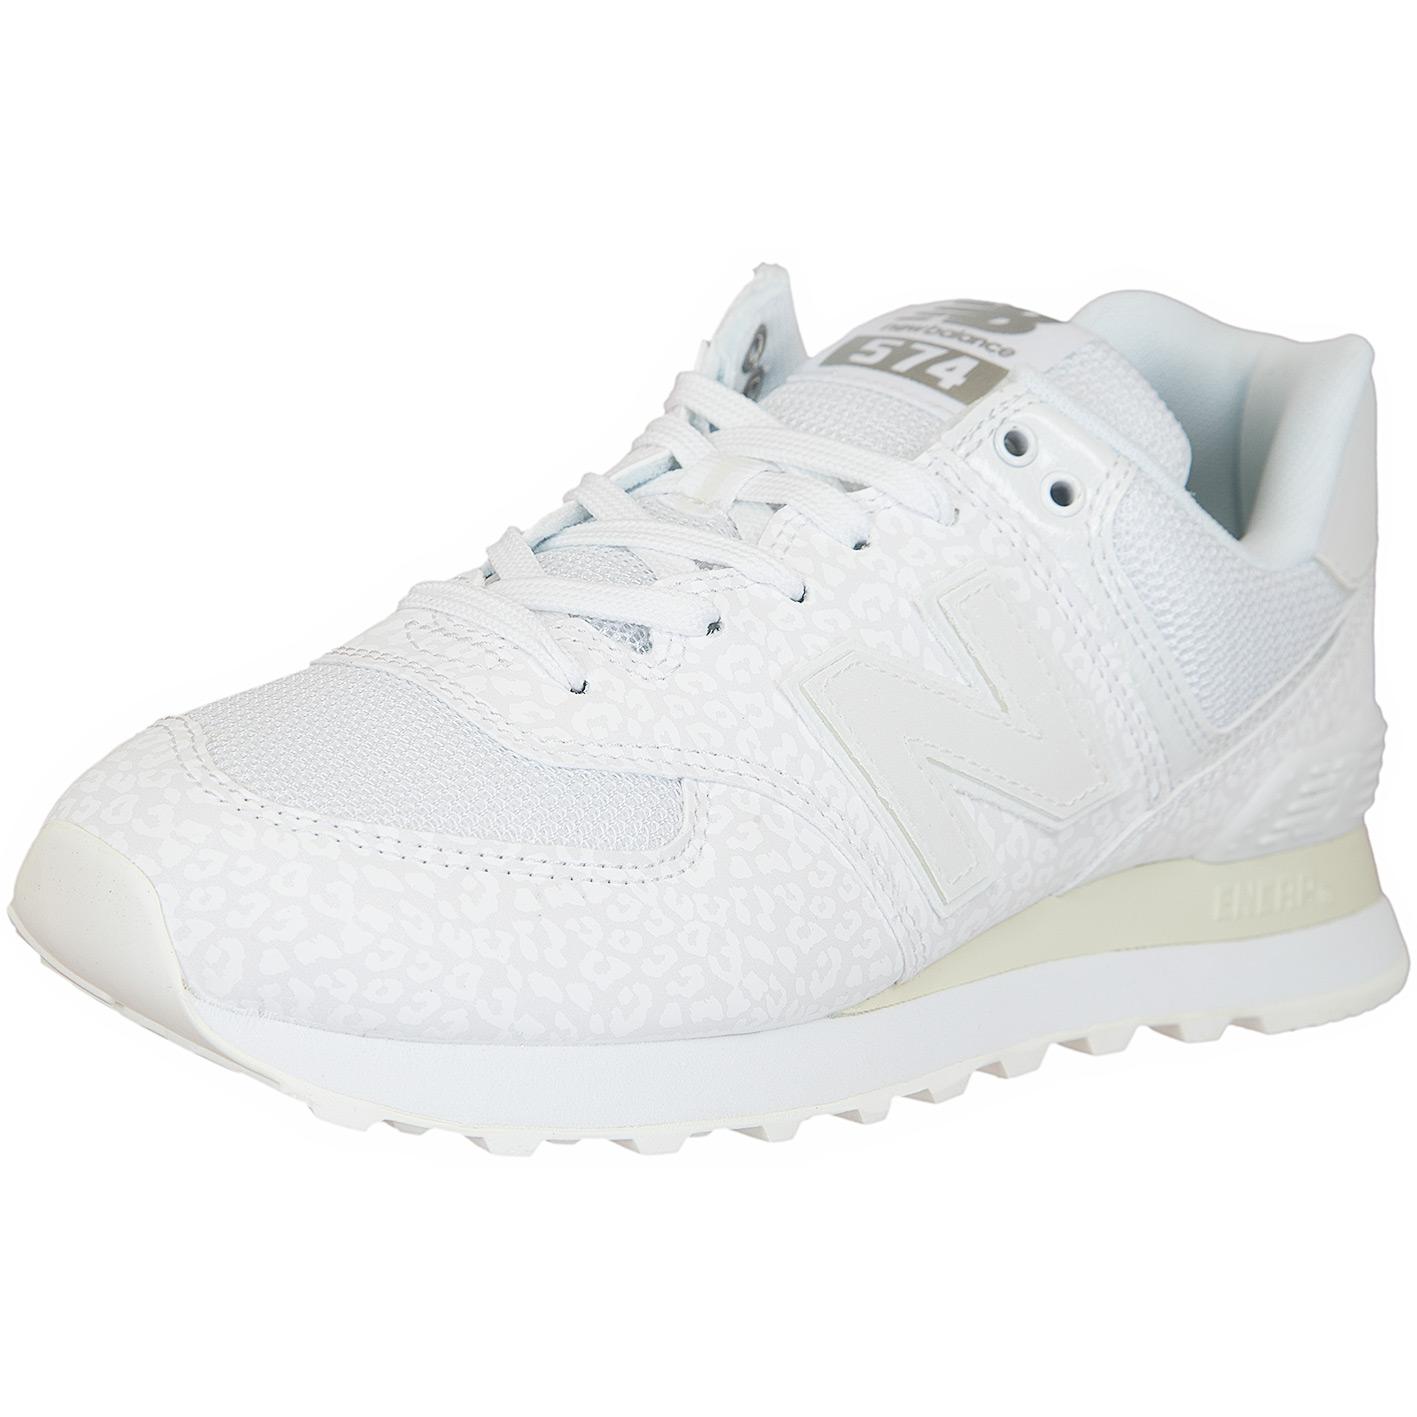 ☆ New Balance Damen Sneaker 574 Synthetik/Textil weiß ...